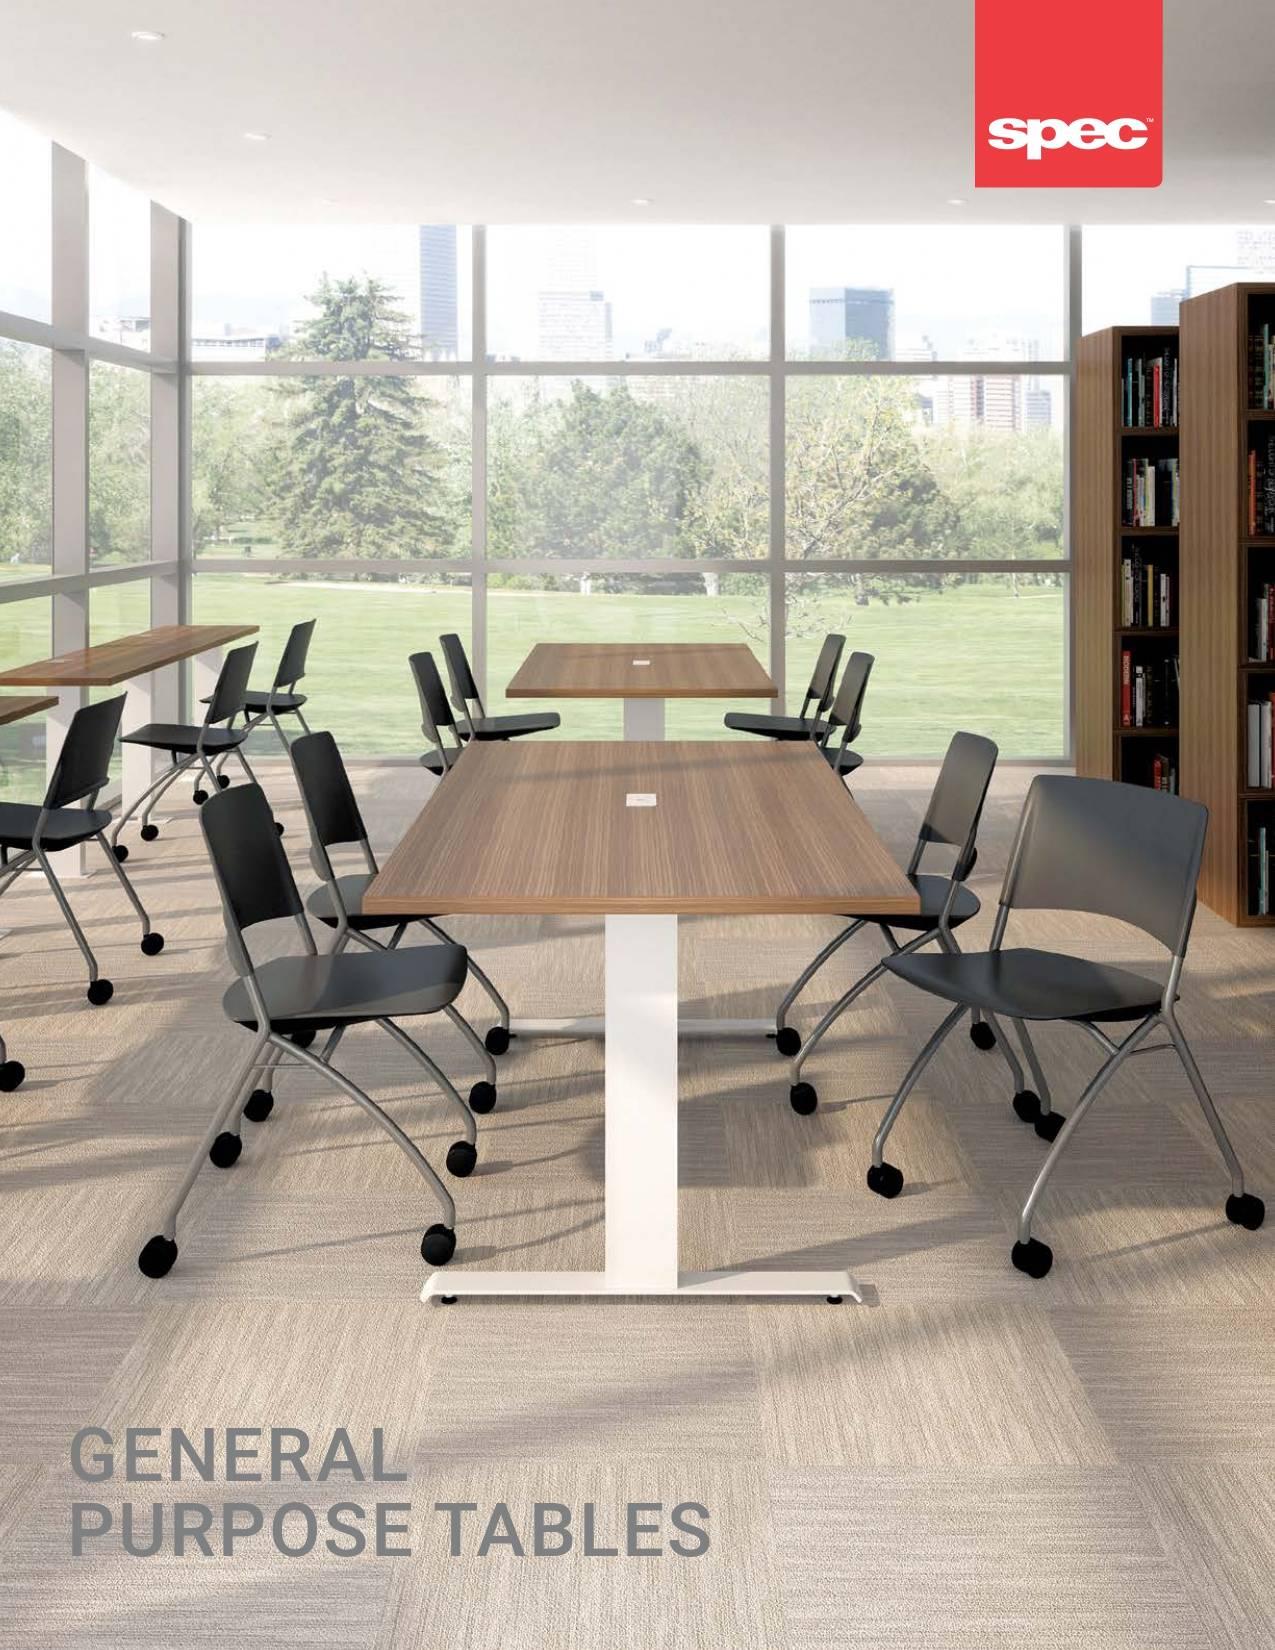 Spec Furniture General Purpose Tables Brochure